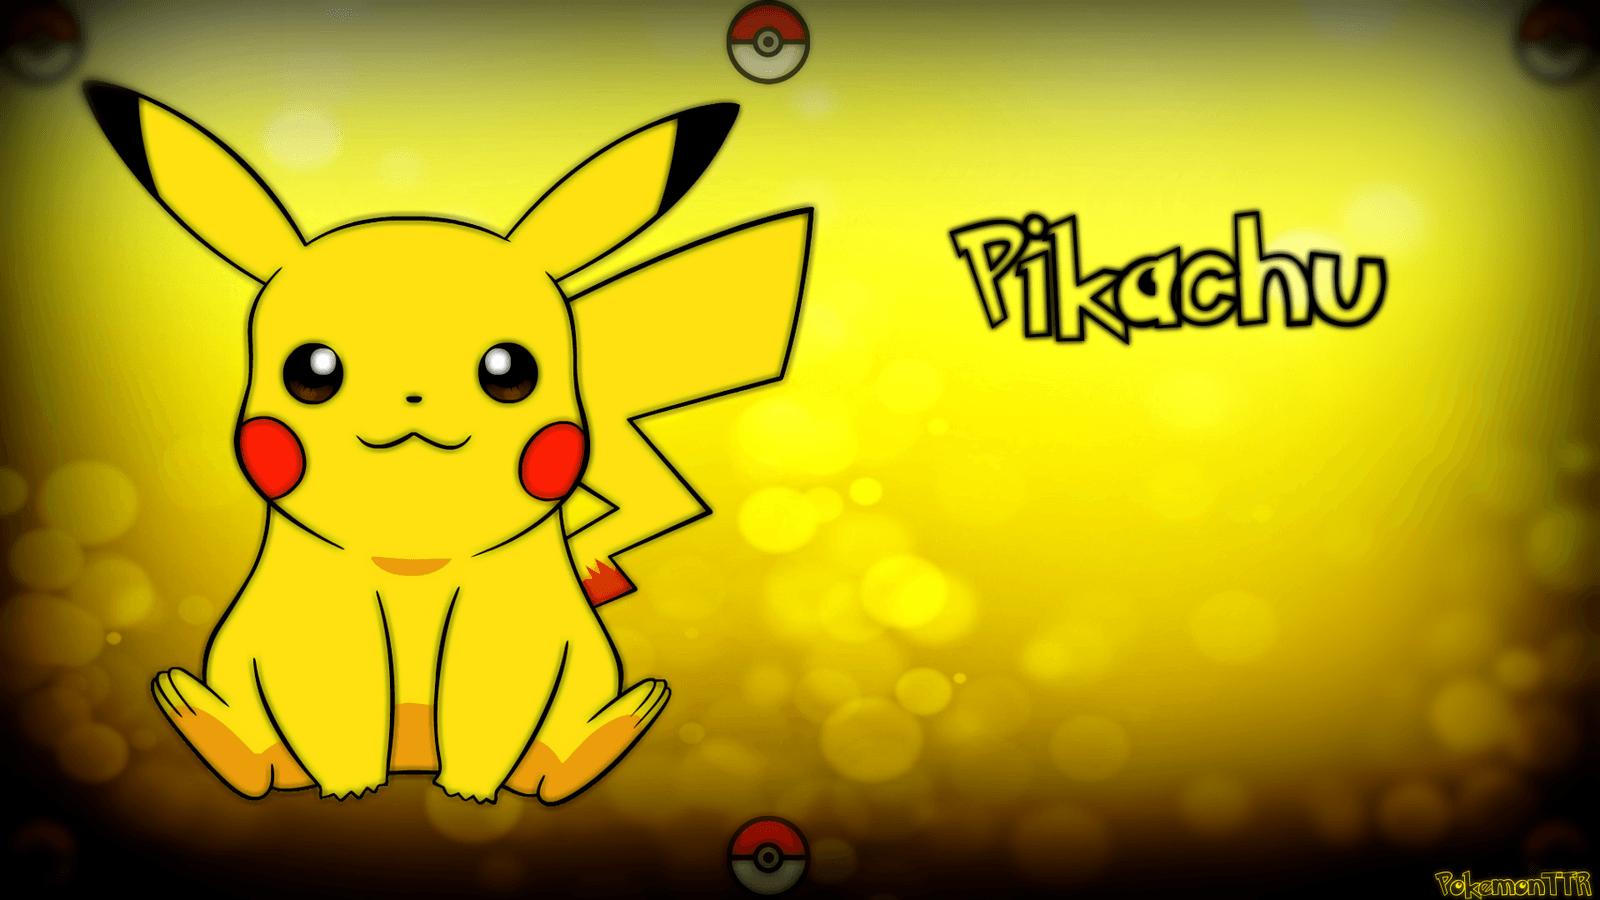 Pikachu Laptop Wallpapers Top Free Pikachu Laptop Backgrounds